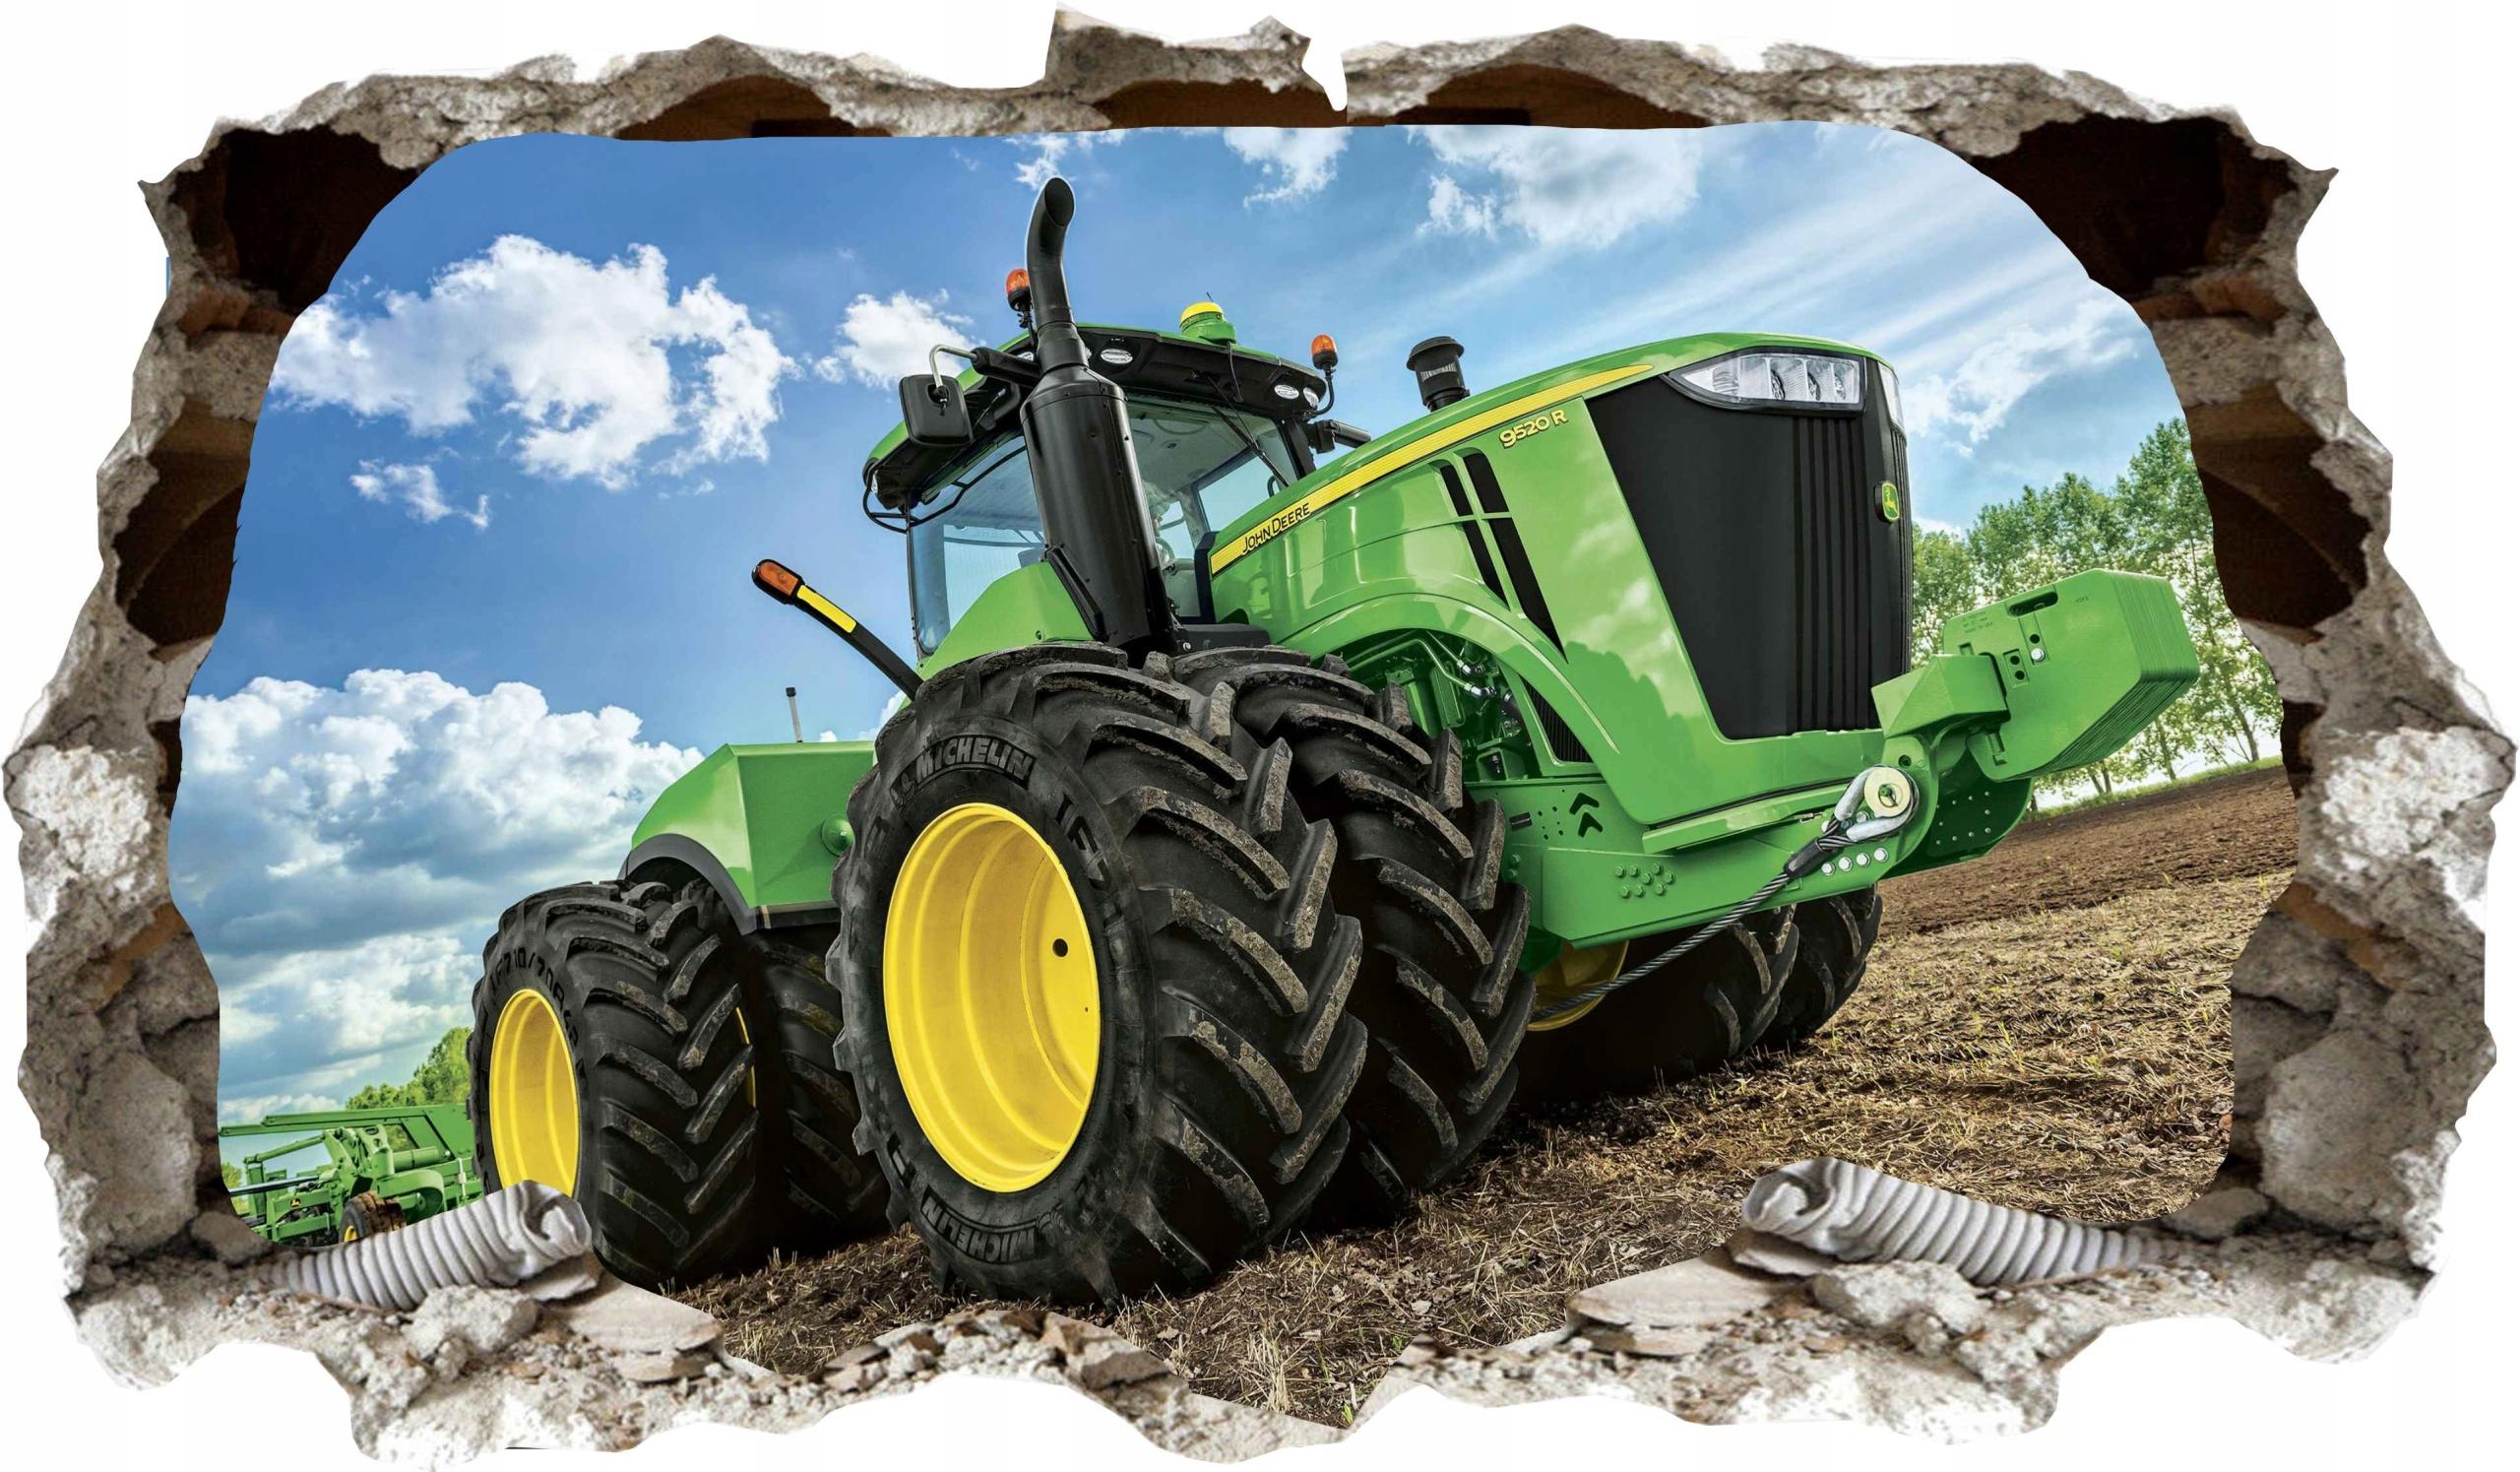 Naklejki Traktor Kombajn Maszyny Rolnicze 7509982116 Allegro Pl